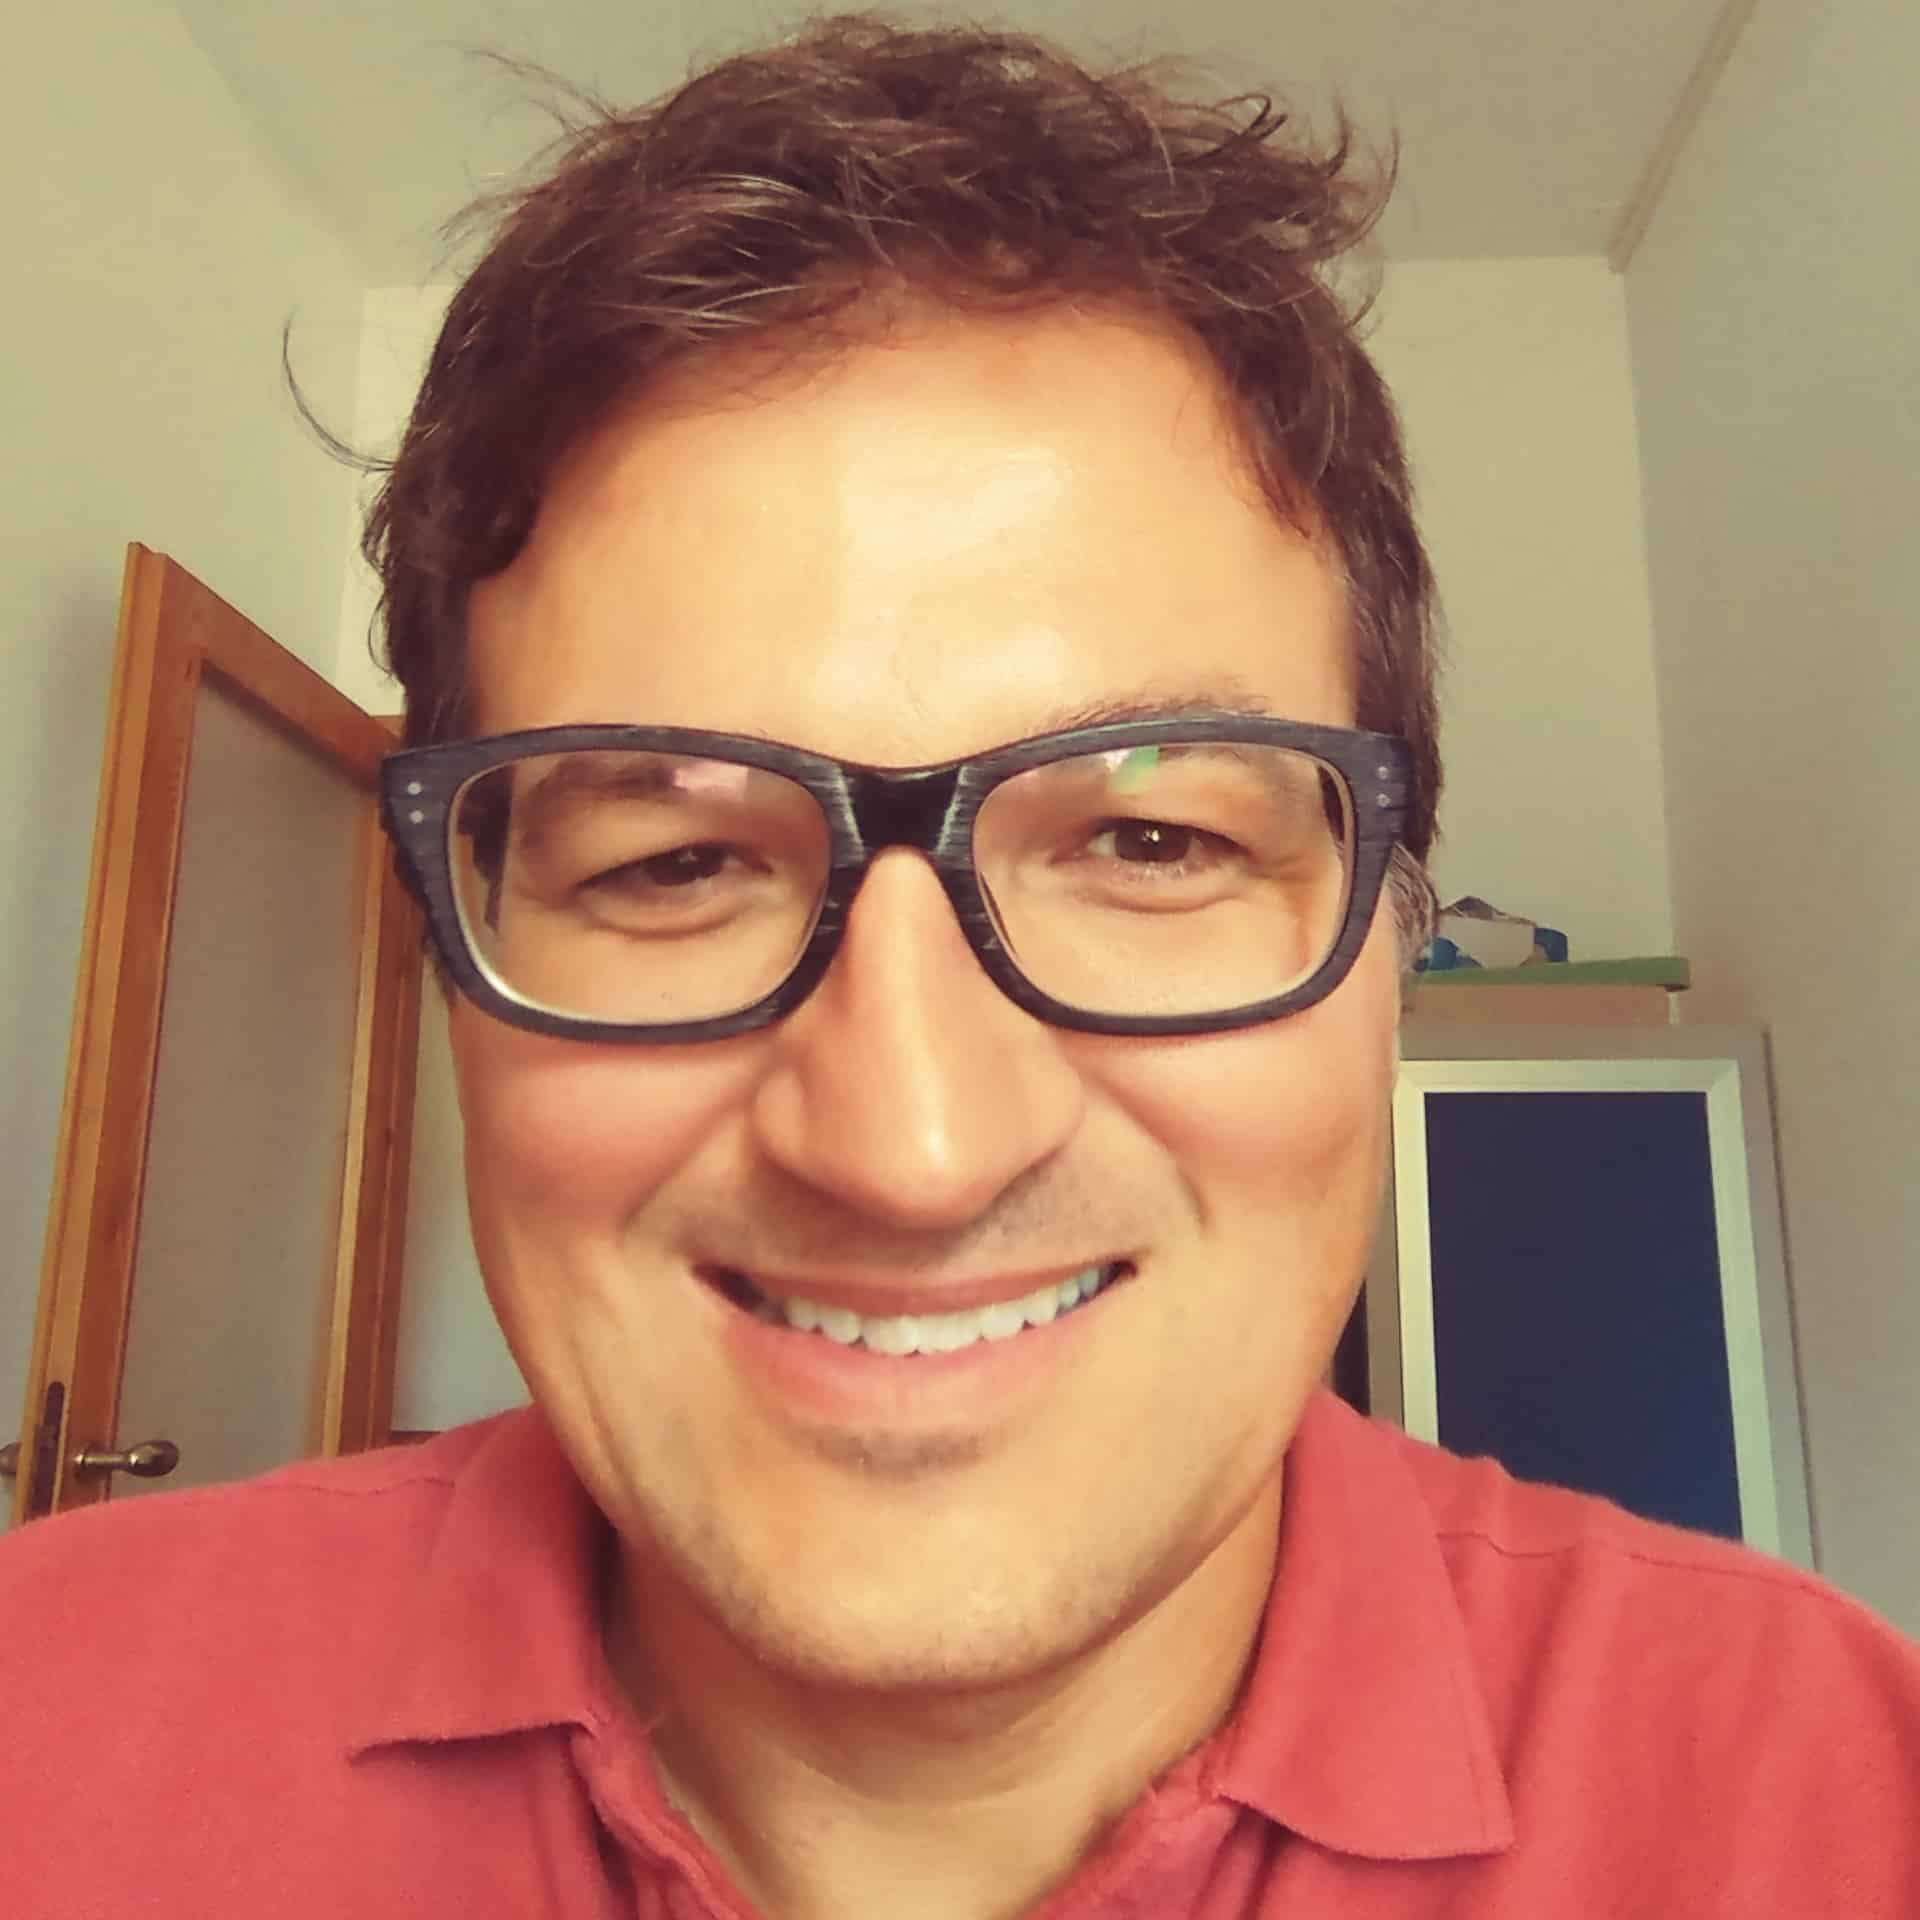 https://digitalmeet.it/wp-content/uploads/2016/03/ALESSANDRO-RADAELLI-PRESIDENTE-ISTITUTO-ROMANO-BRUNI-.jpg